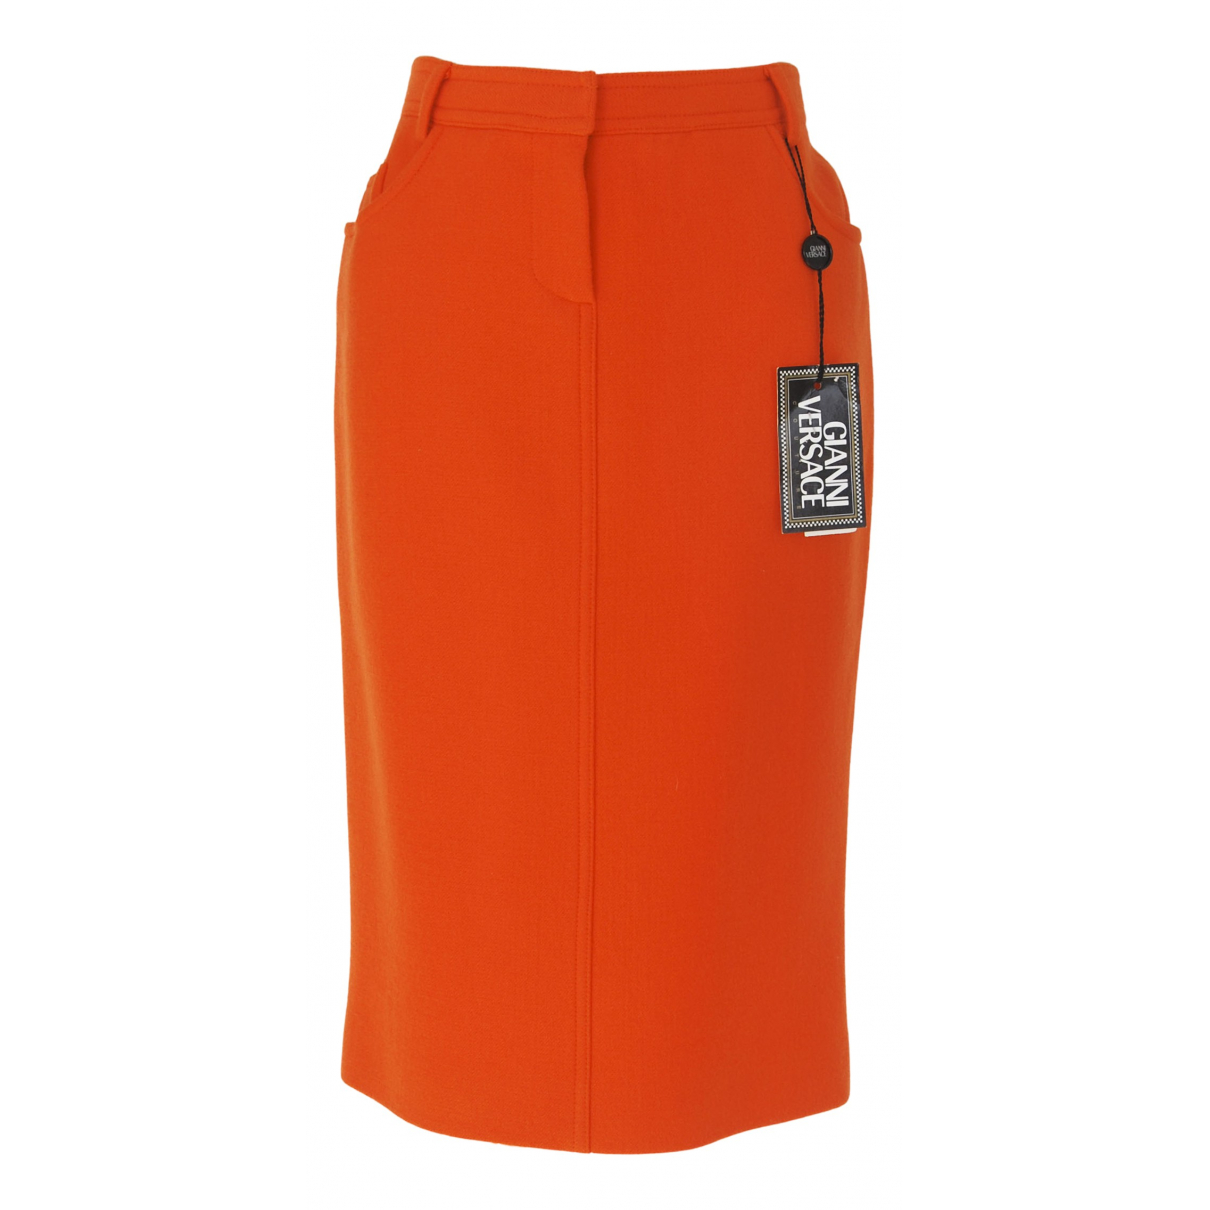 Gianni Versace \N Orange Wool skirt for Women 42 IT